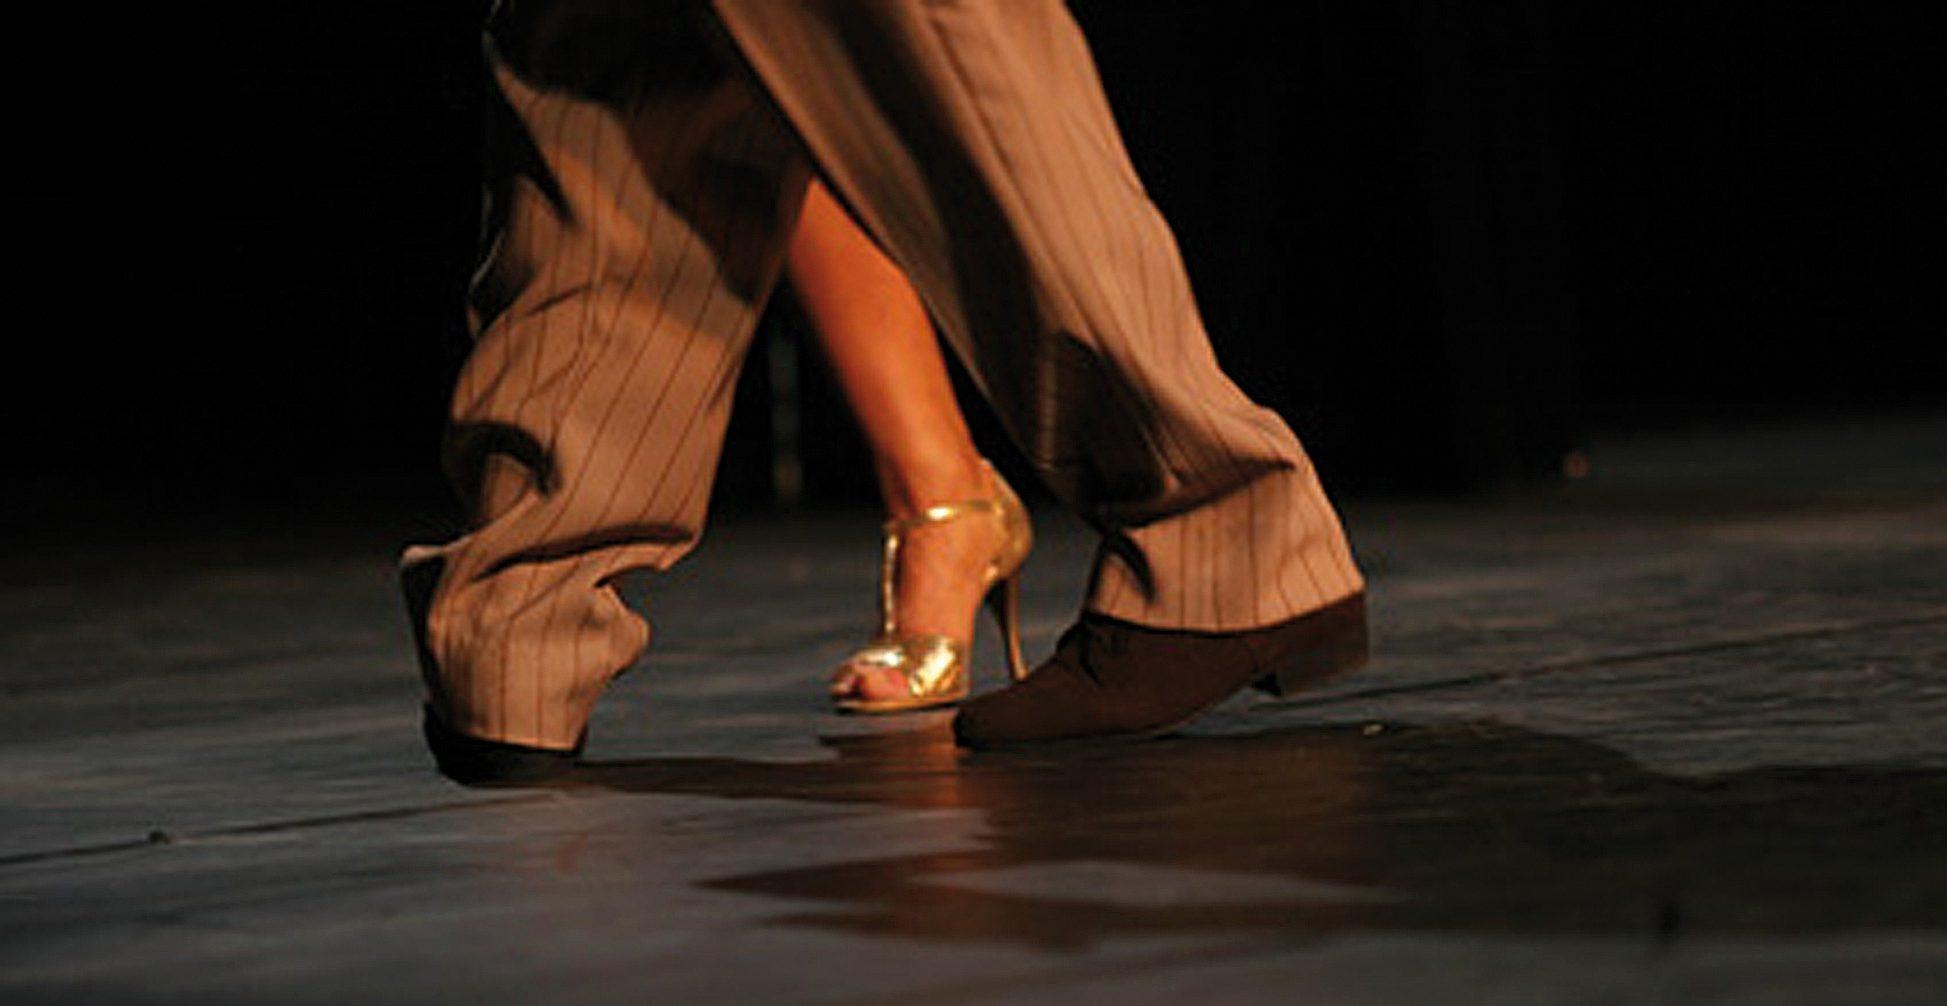 tanzmusik Motiv quer